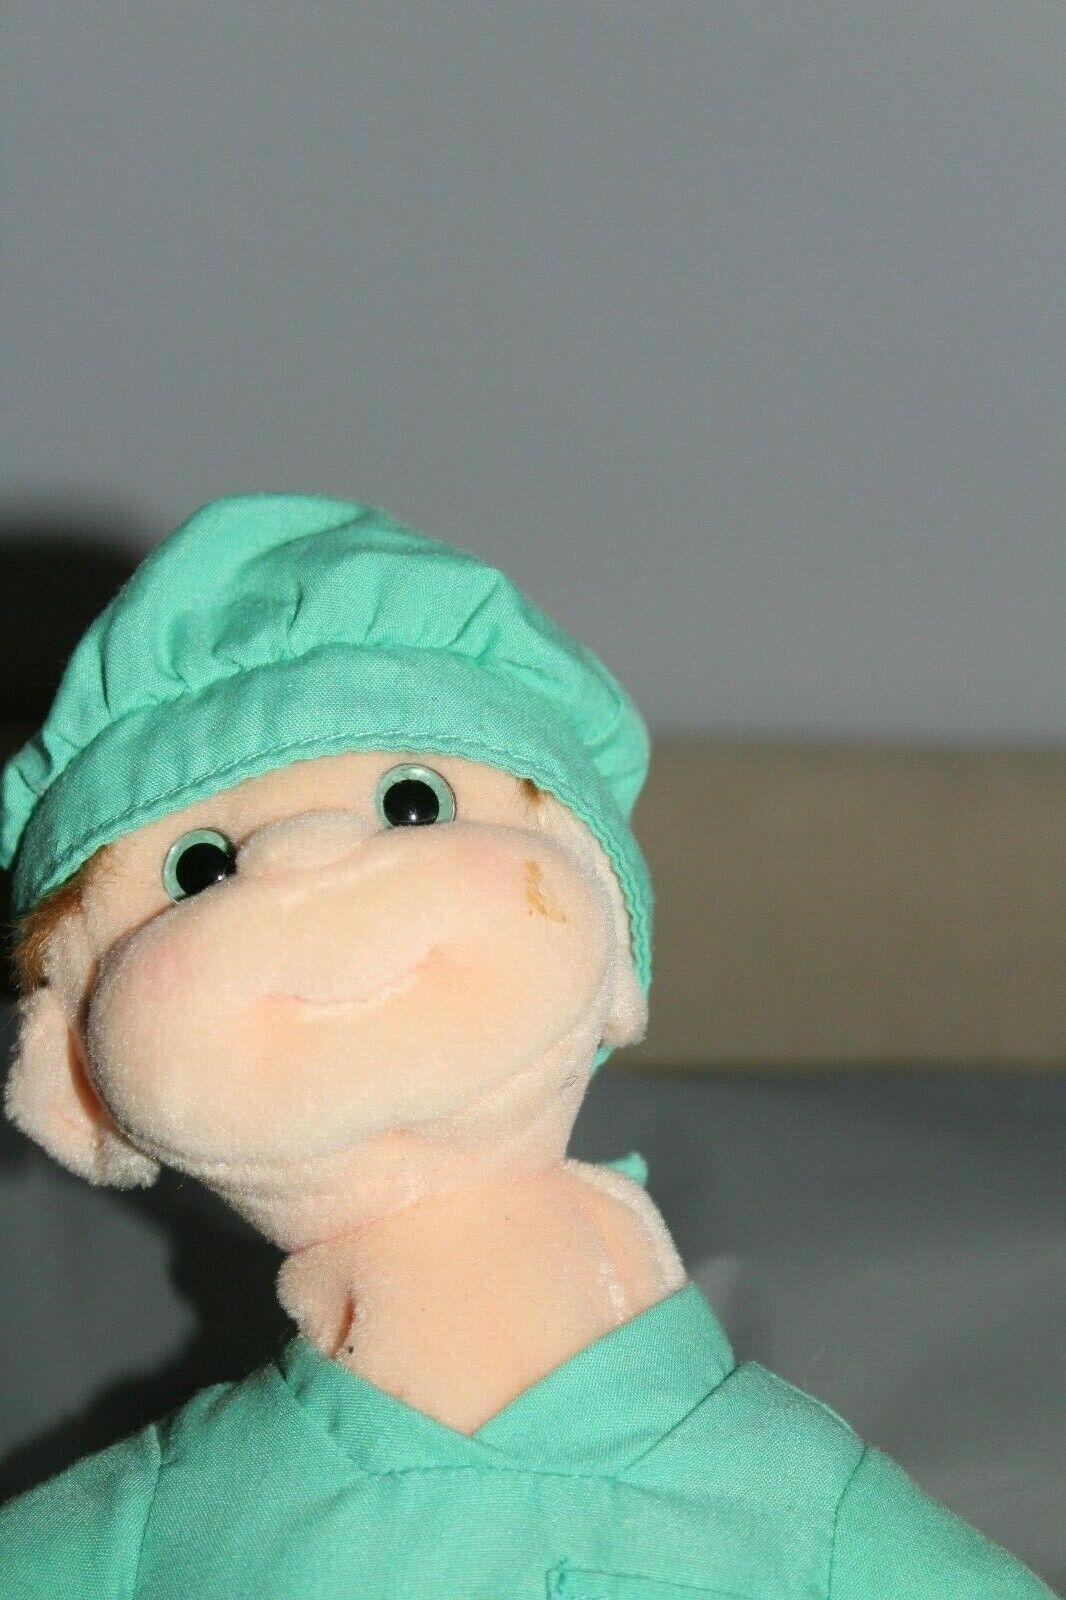 TY Beanie Baby Kid Buzz Boy Stuffed Animal In Scrubs outfit Toy